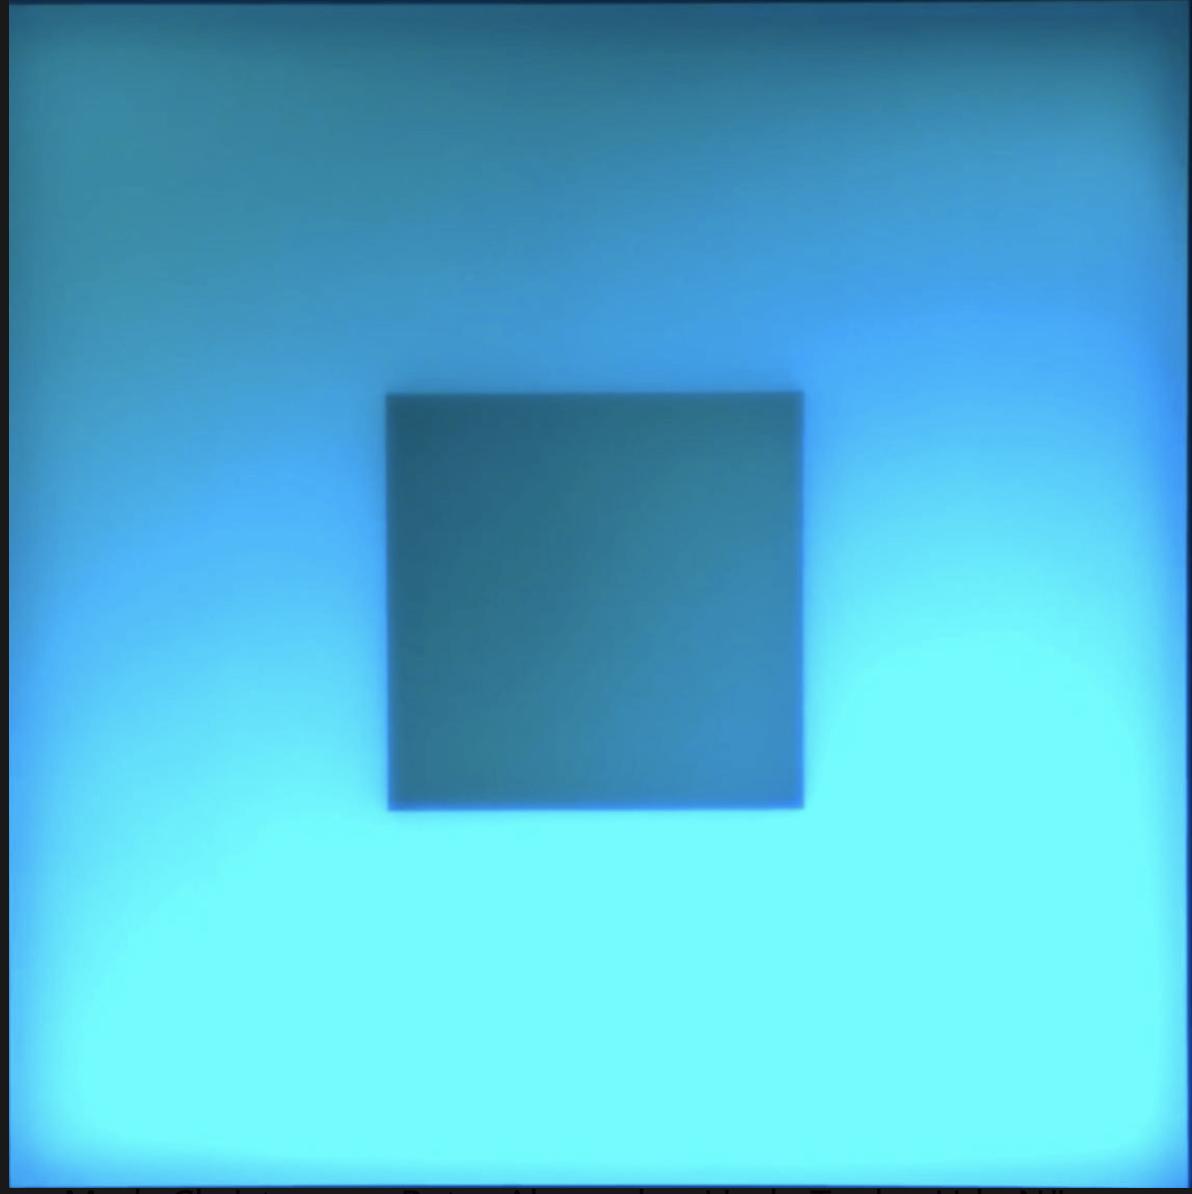 event image 1